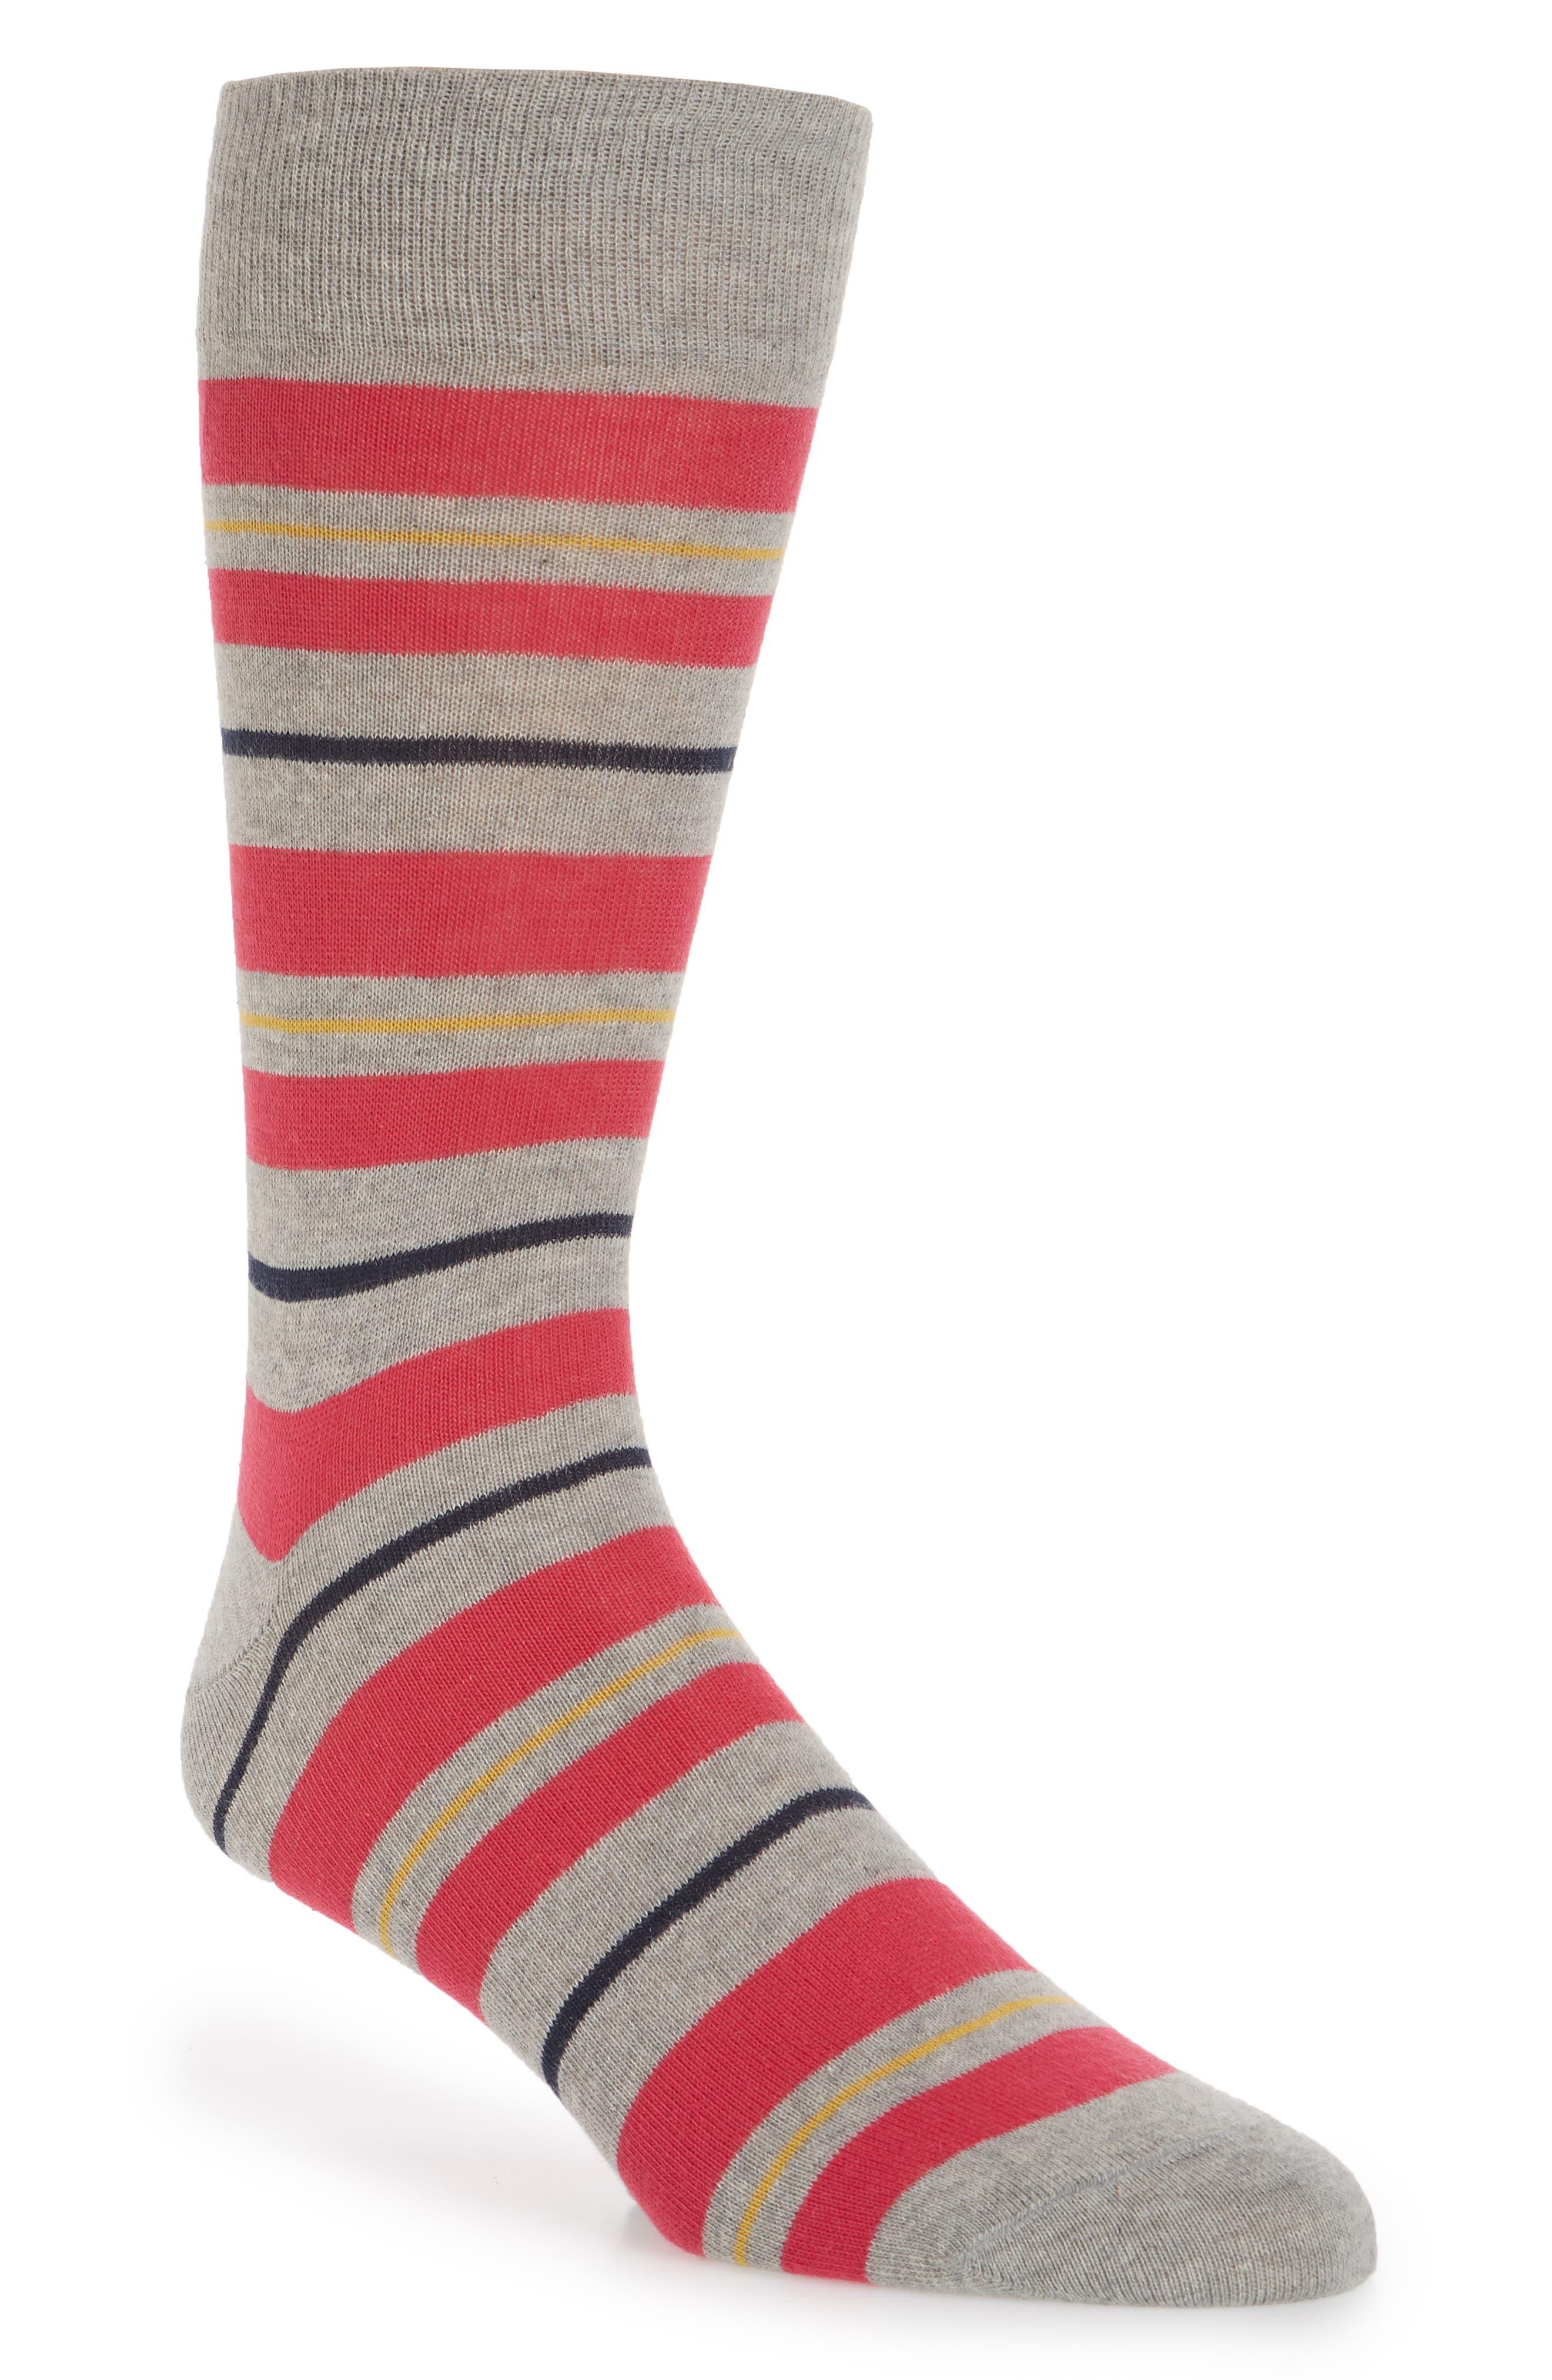 Uneven Stripe Socks,                         Main,                         color, Light Grey